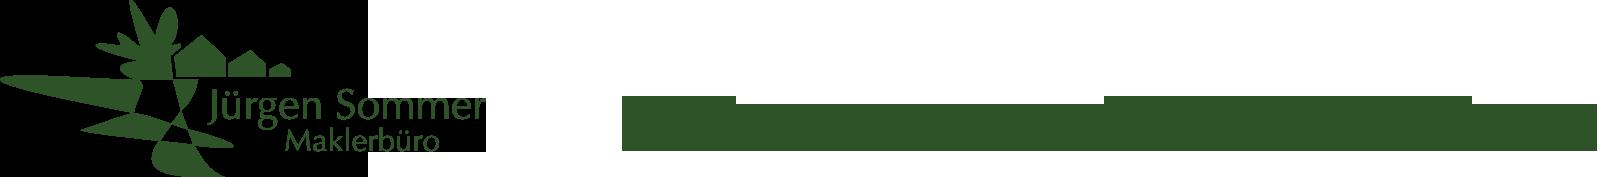 Maklerbüro Jürgen Sommer Logo